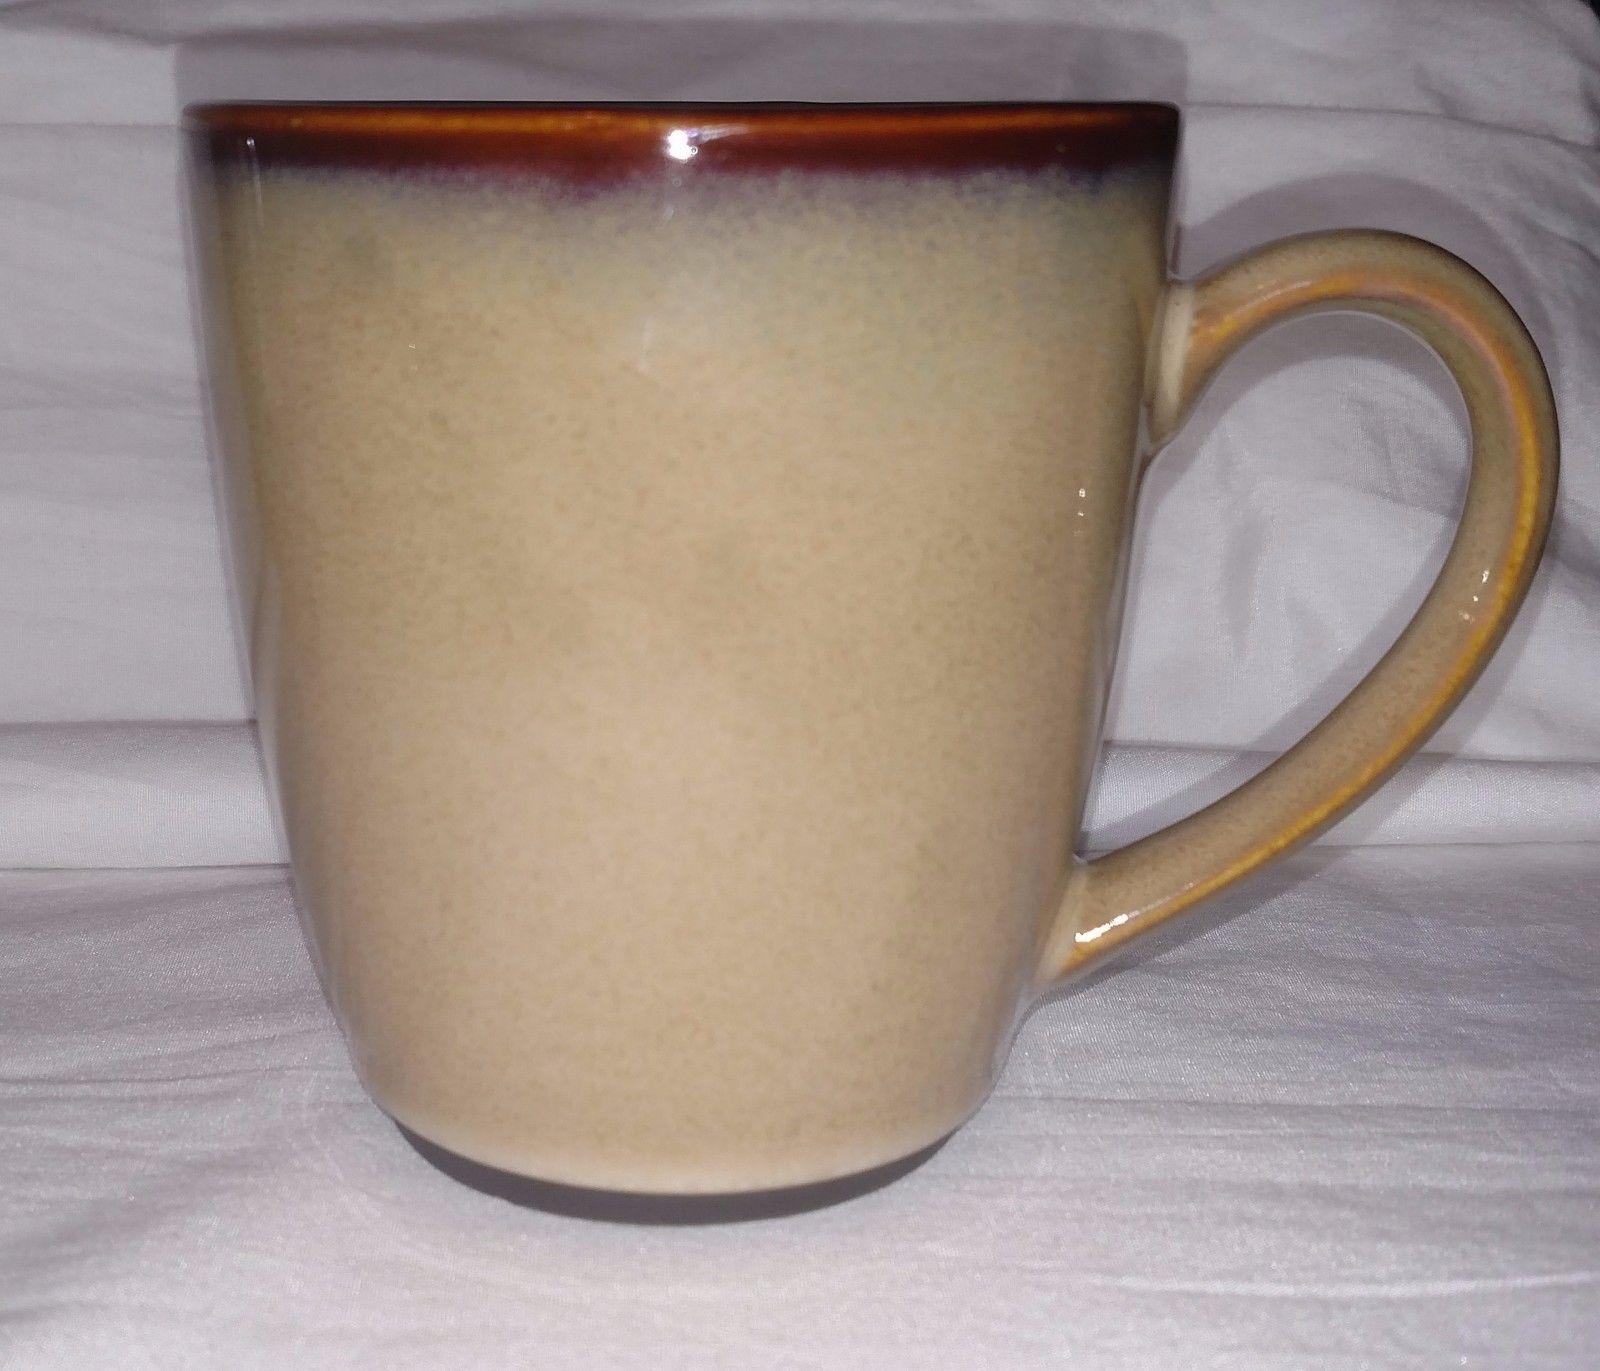 SANGO Nova Brown #4933 China Mug Browns Cup and 34 similar items